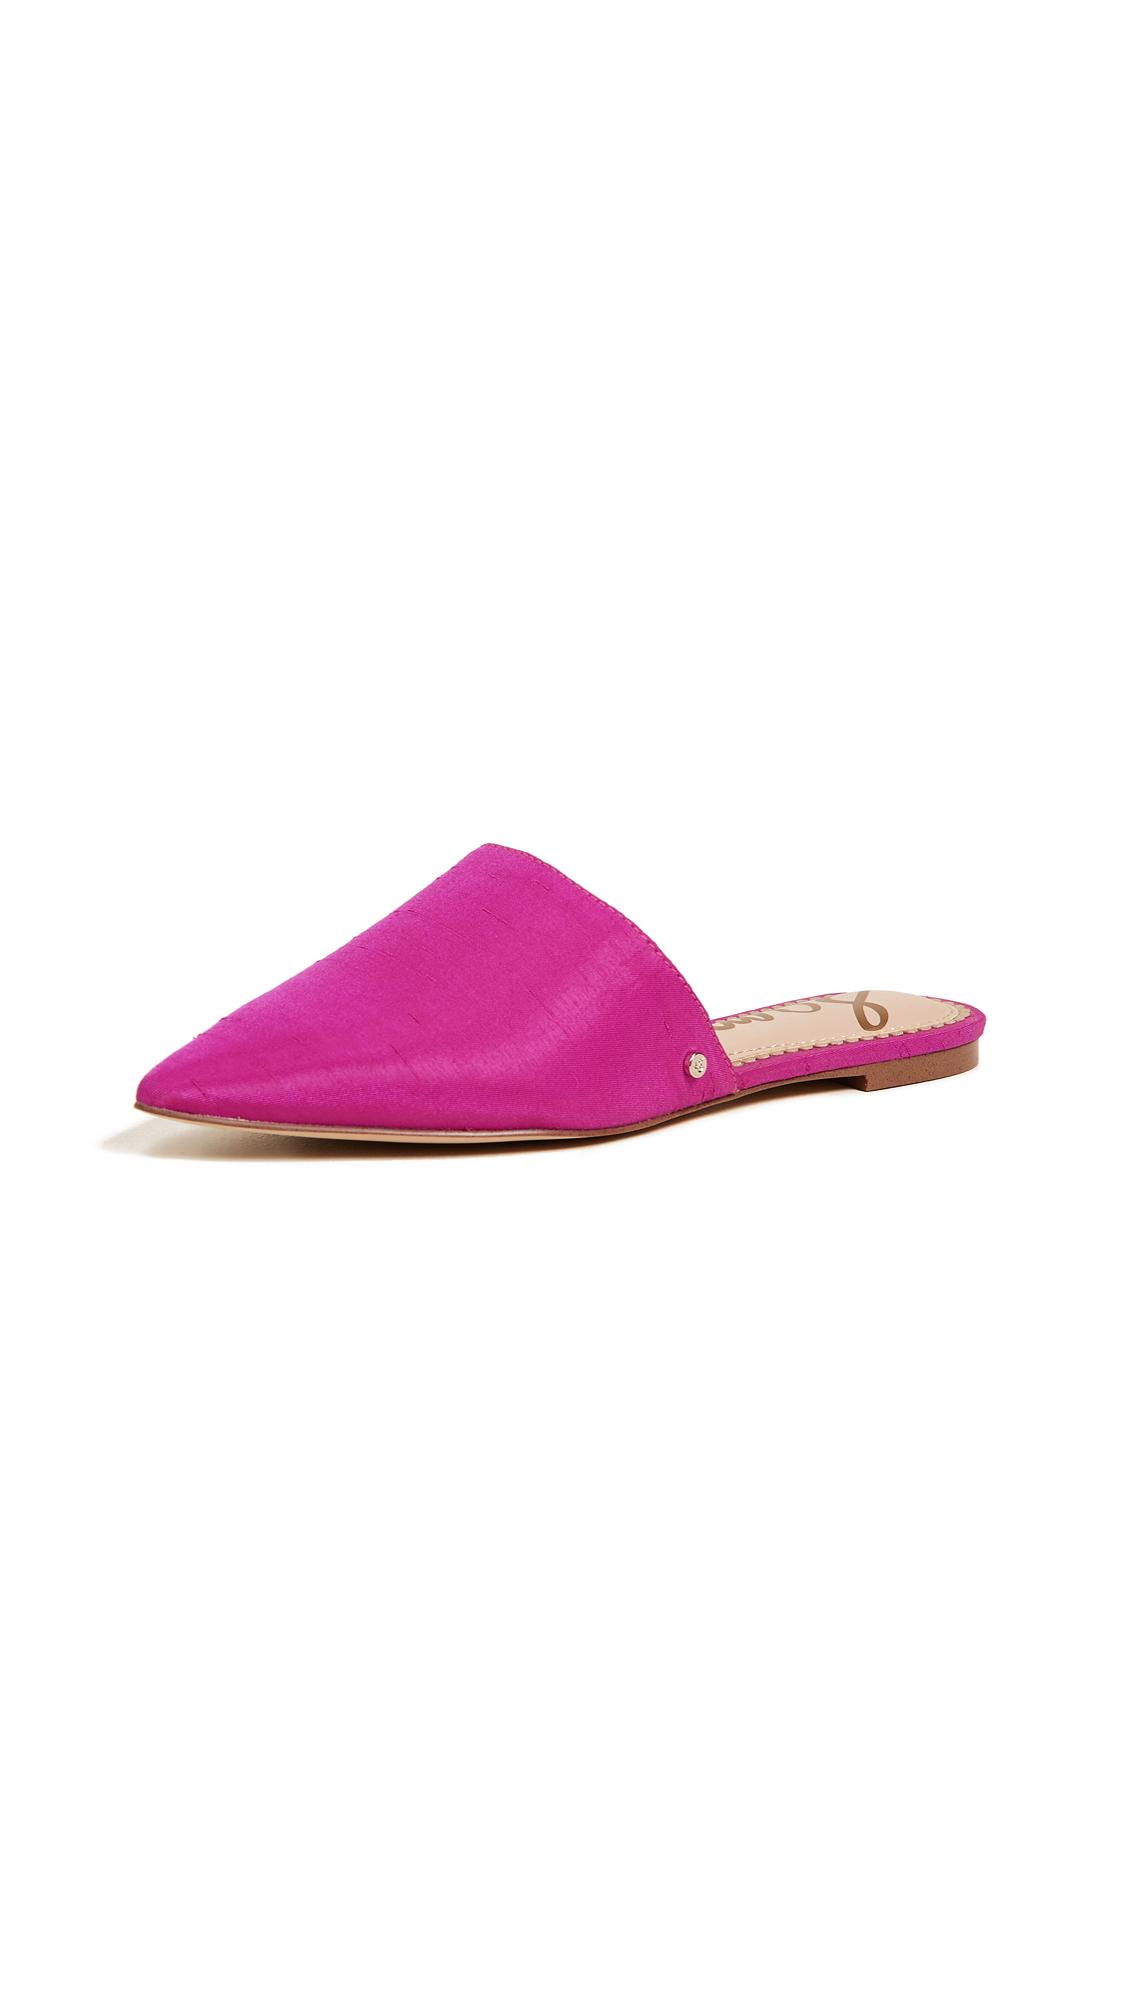 Sam Edelman Rumi Mules - Pink Magenta